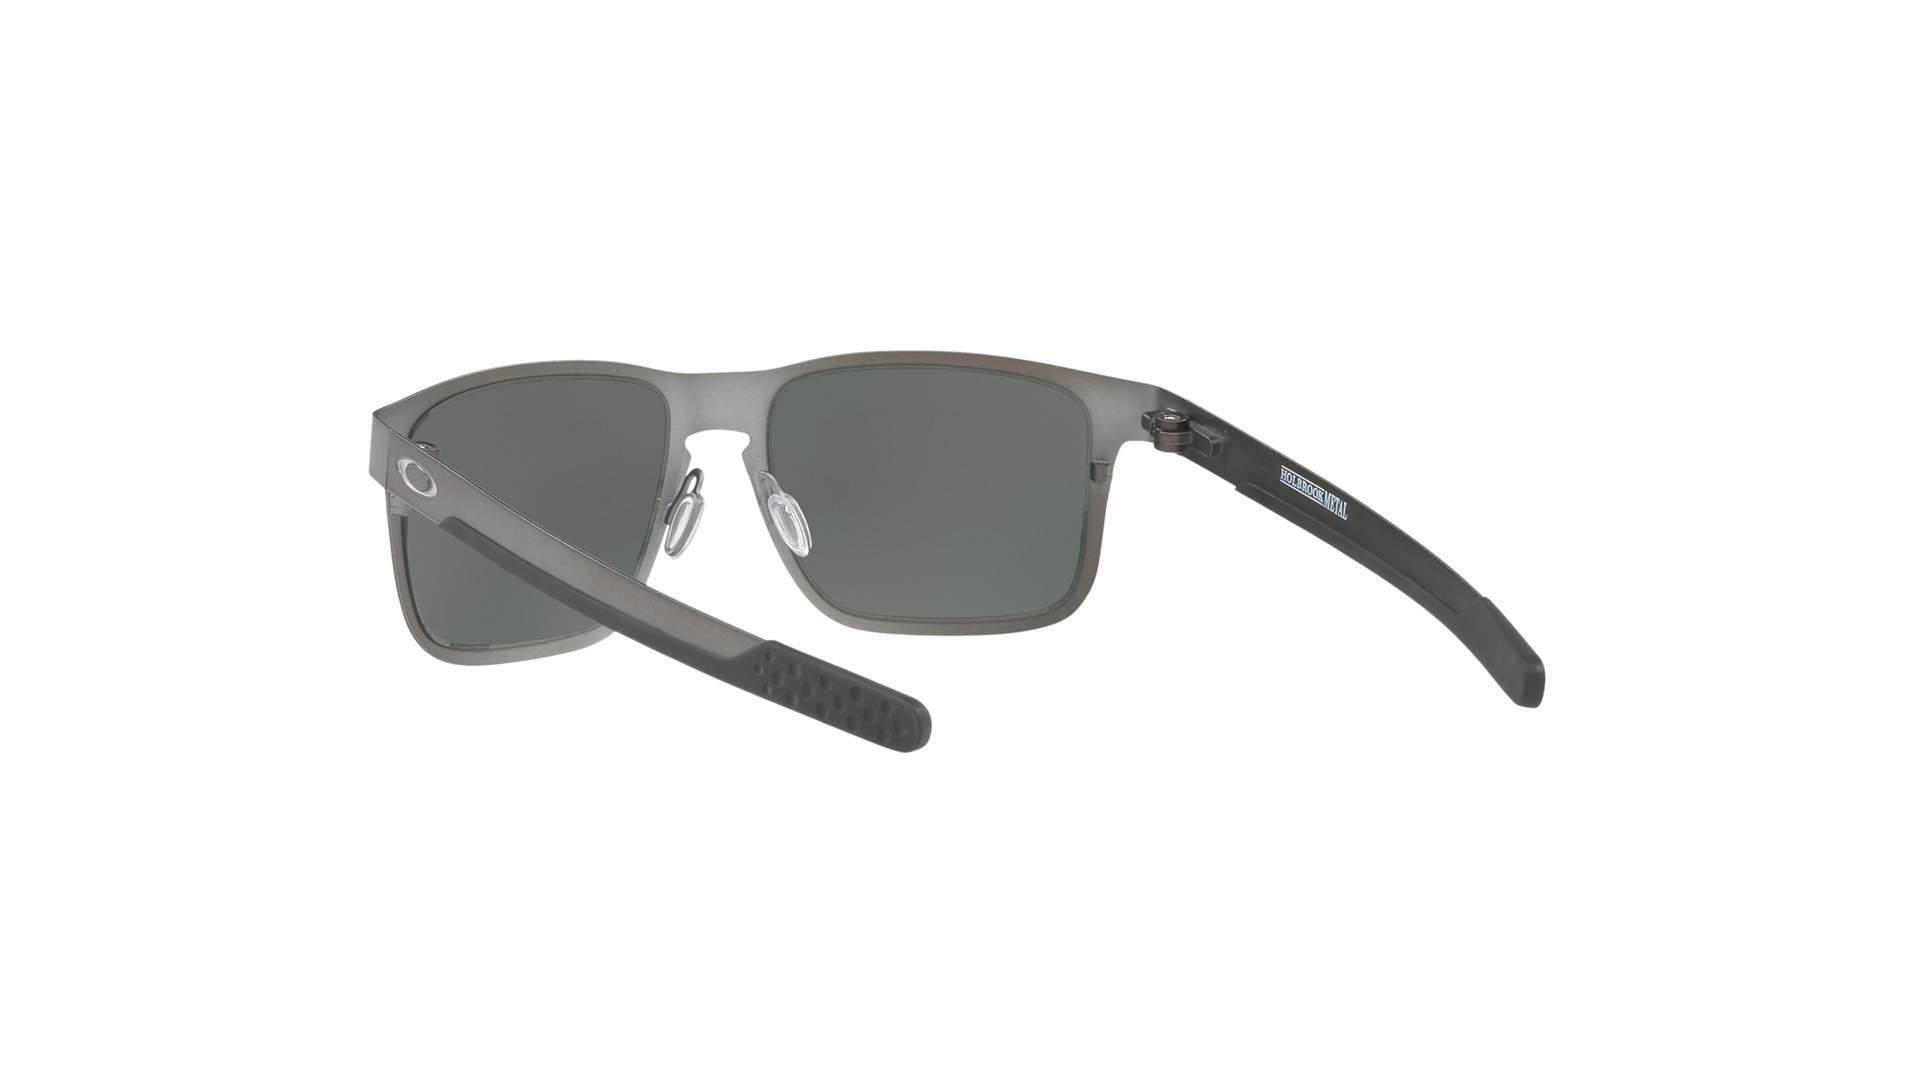 675a0c66d6884 Sunglasses Oakley Holbrook Metal Grey Matte Prizm OO4123 06 55-18 Medium  Polarized Mirror